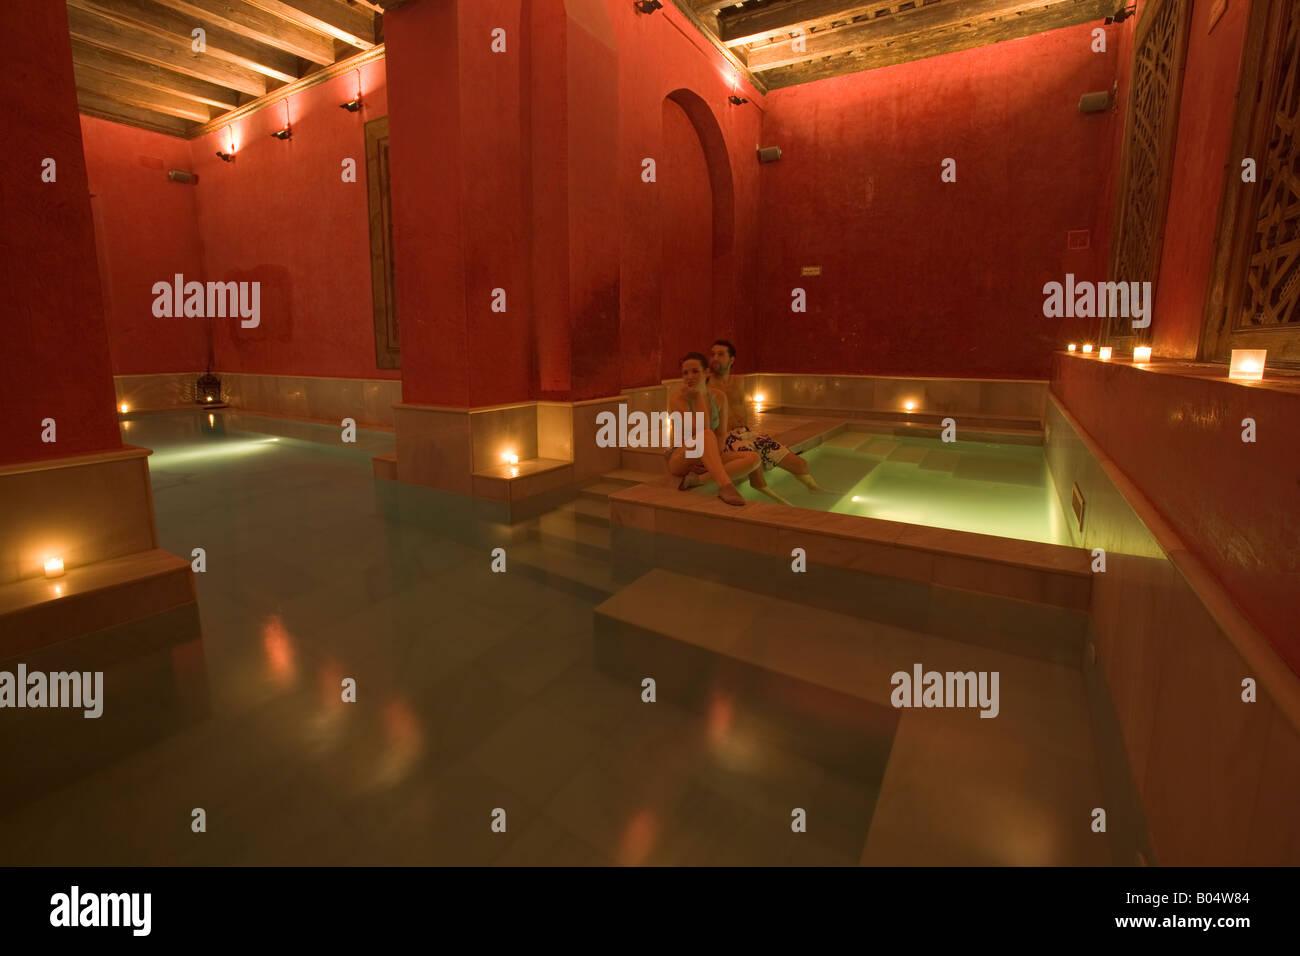 Aire De Sevilla Baños Arabes | Couple In One Of The Three Baths At Aire De Sevilla Banos Arabes